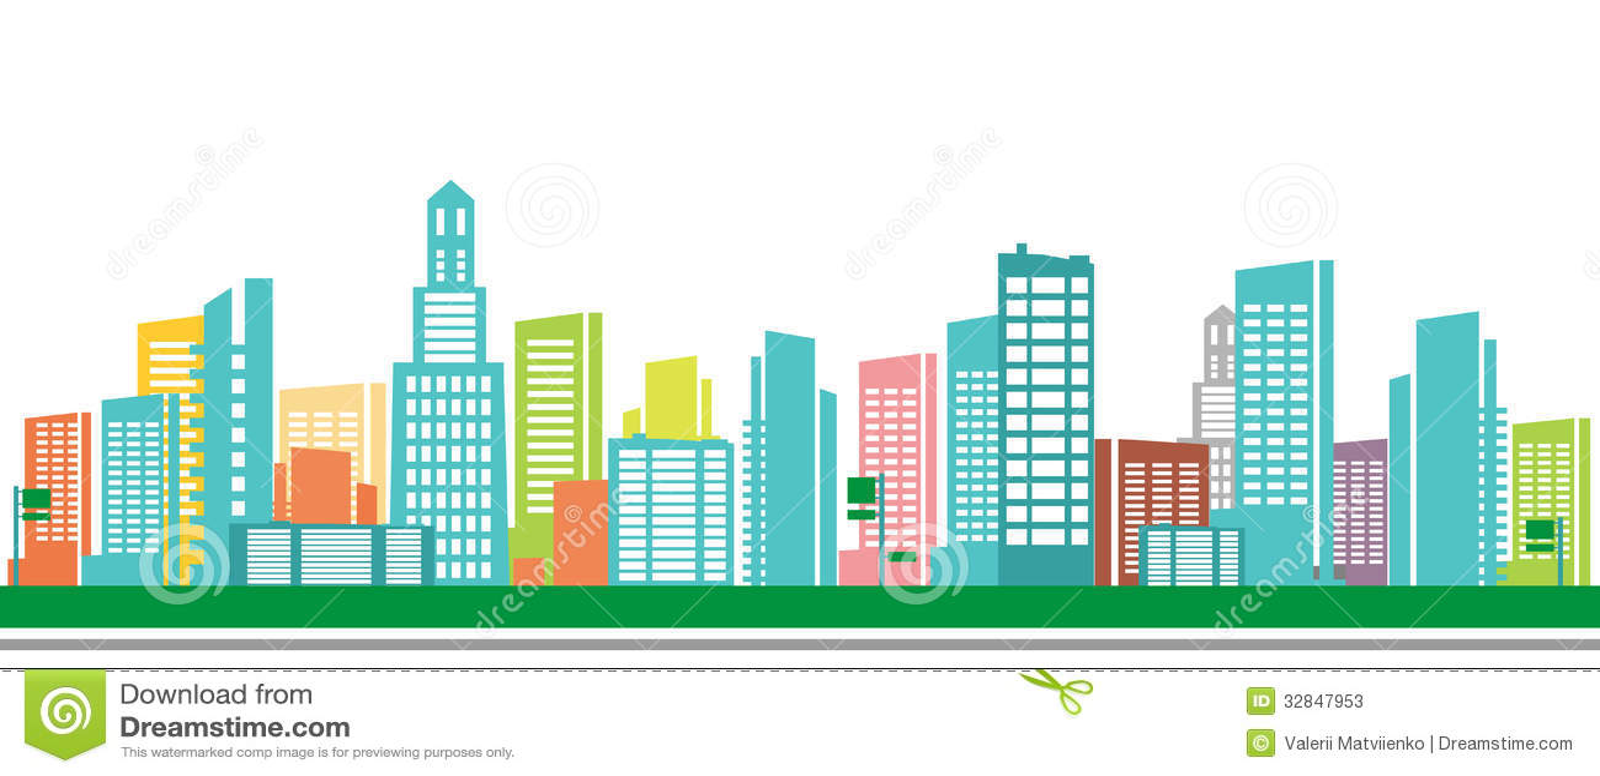 Town Landscape Vector Illustration: Sketch Illustration Stock Vector